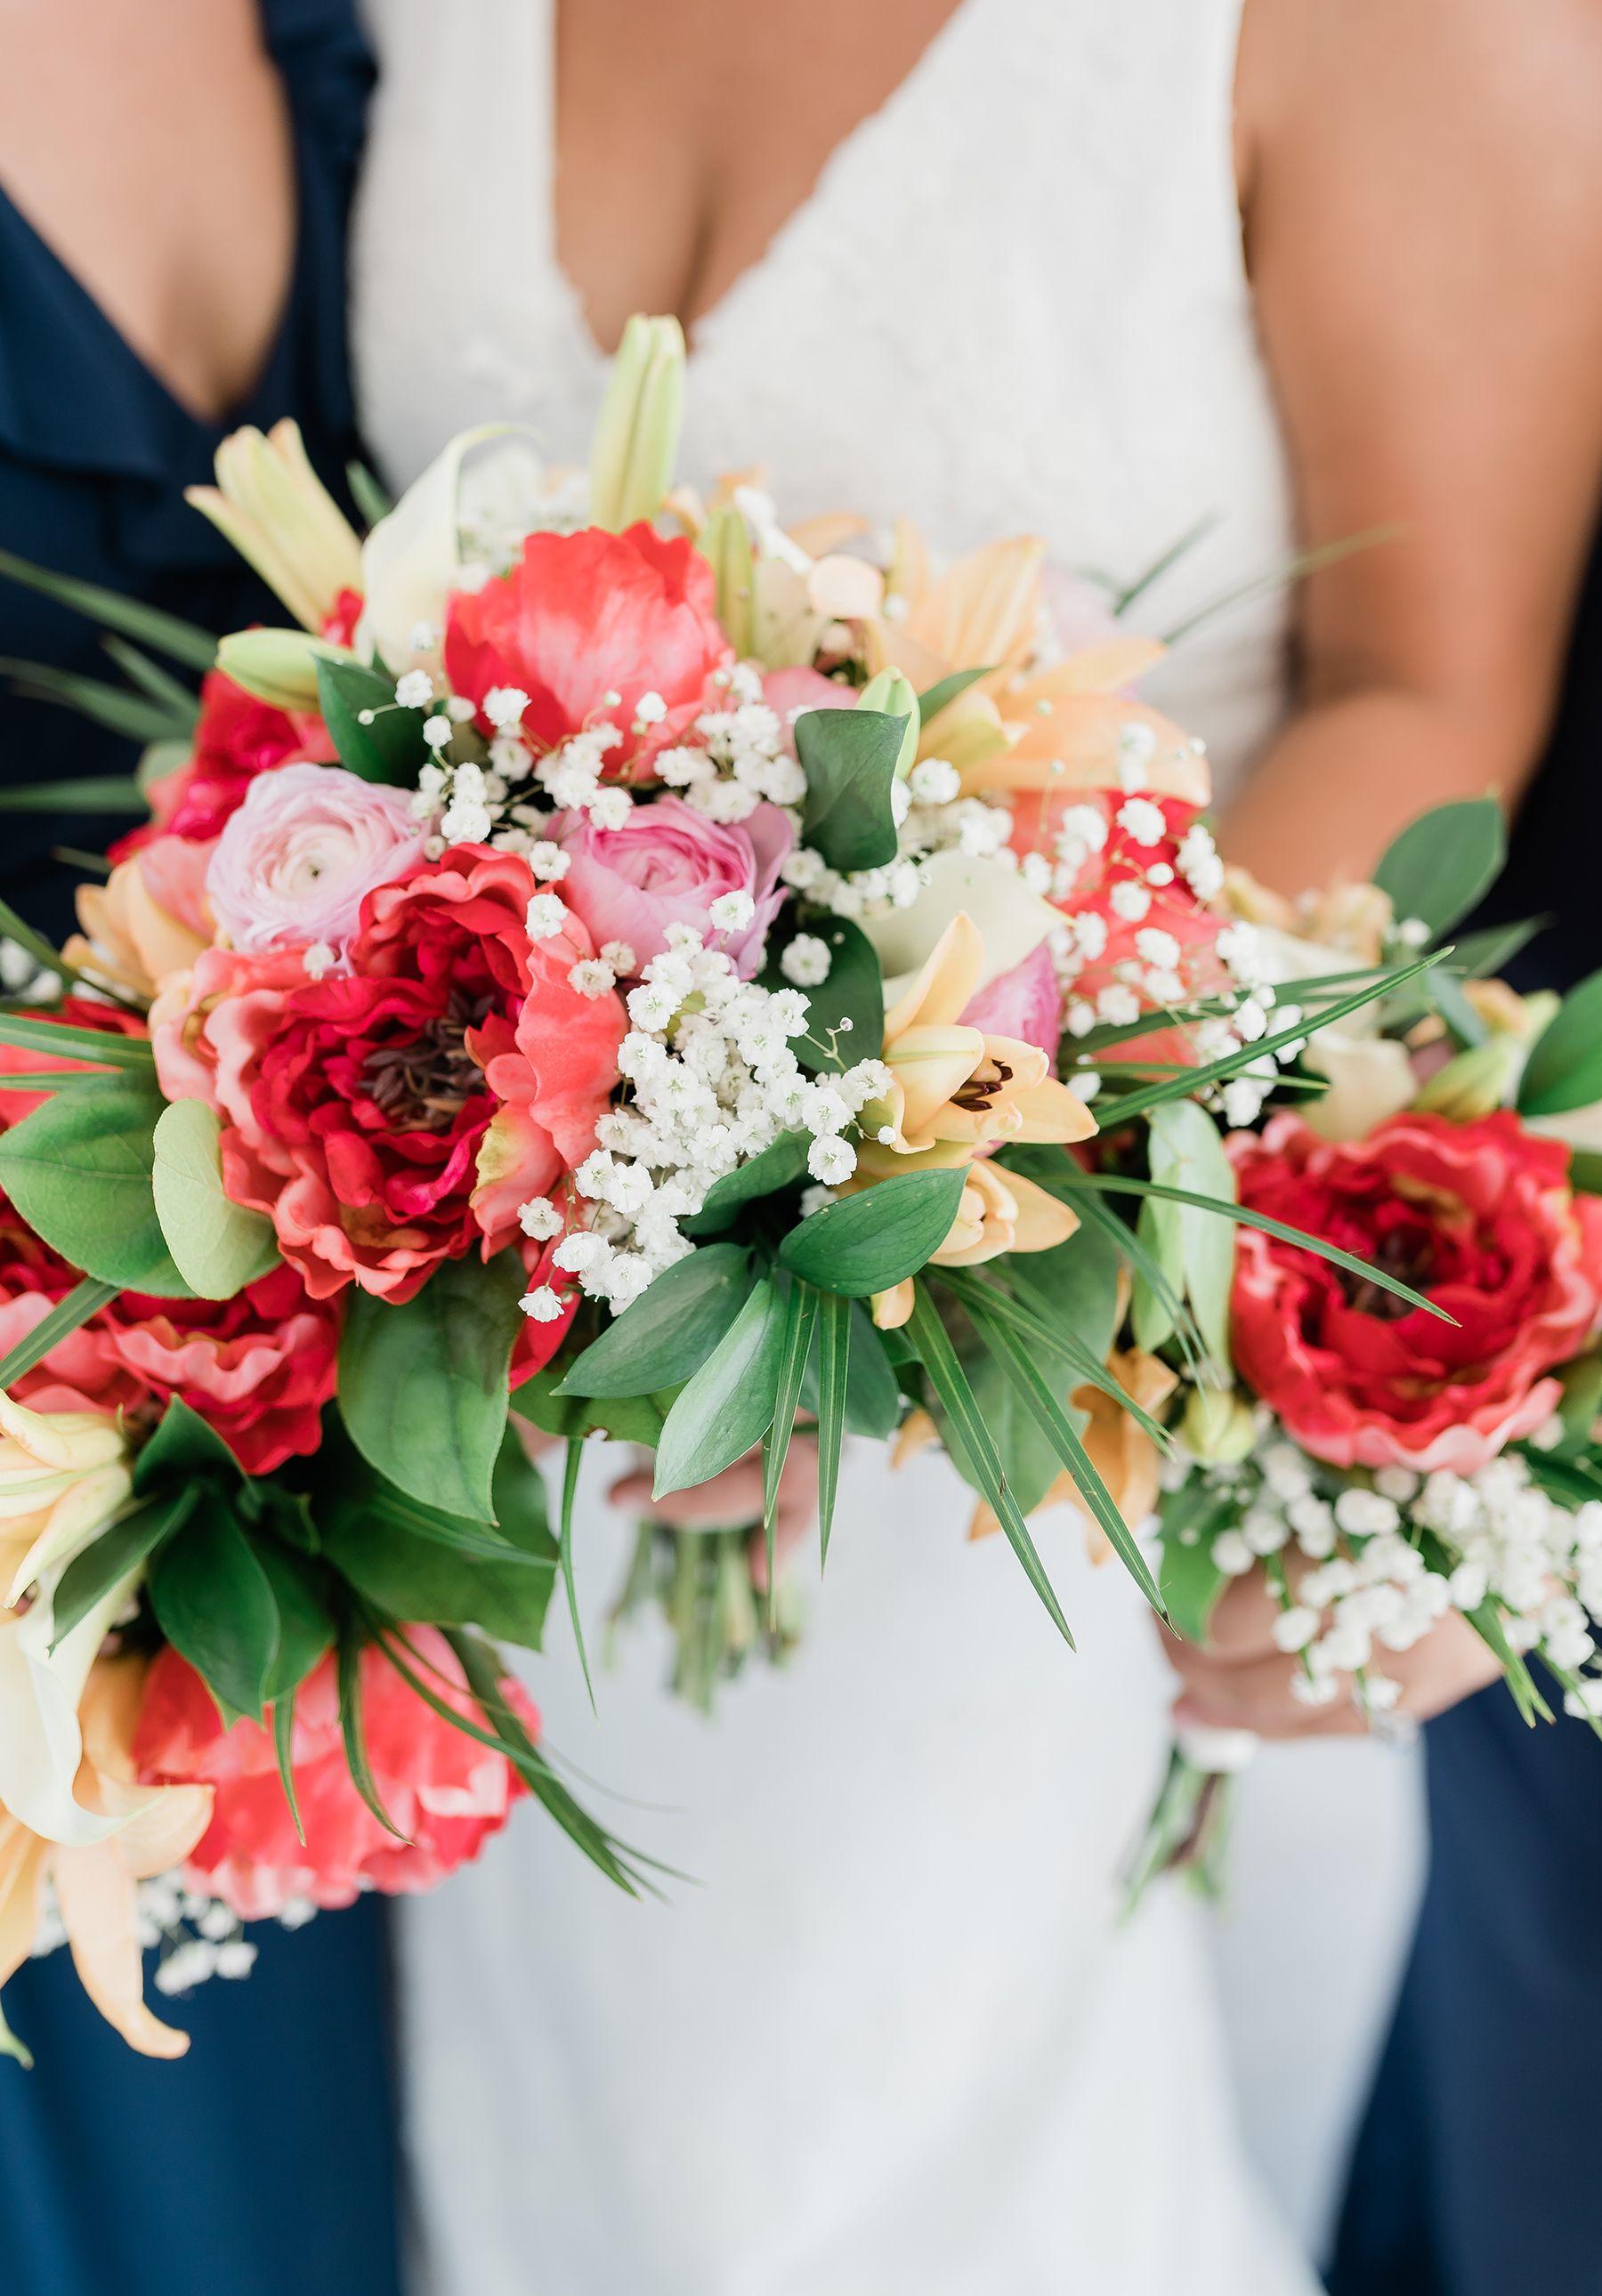 Summer wedding flower ideas, beach wedding colors, wedding